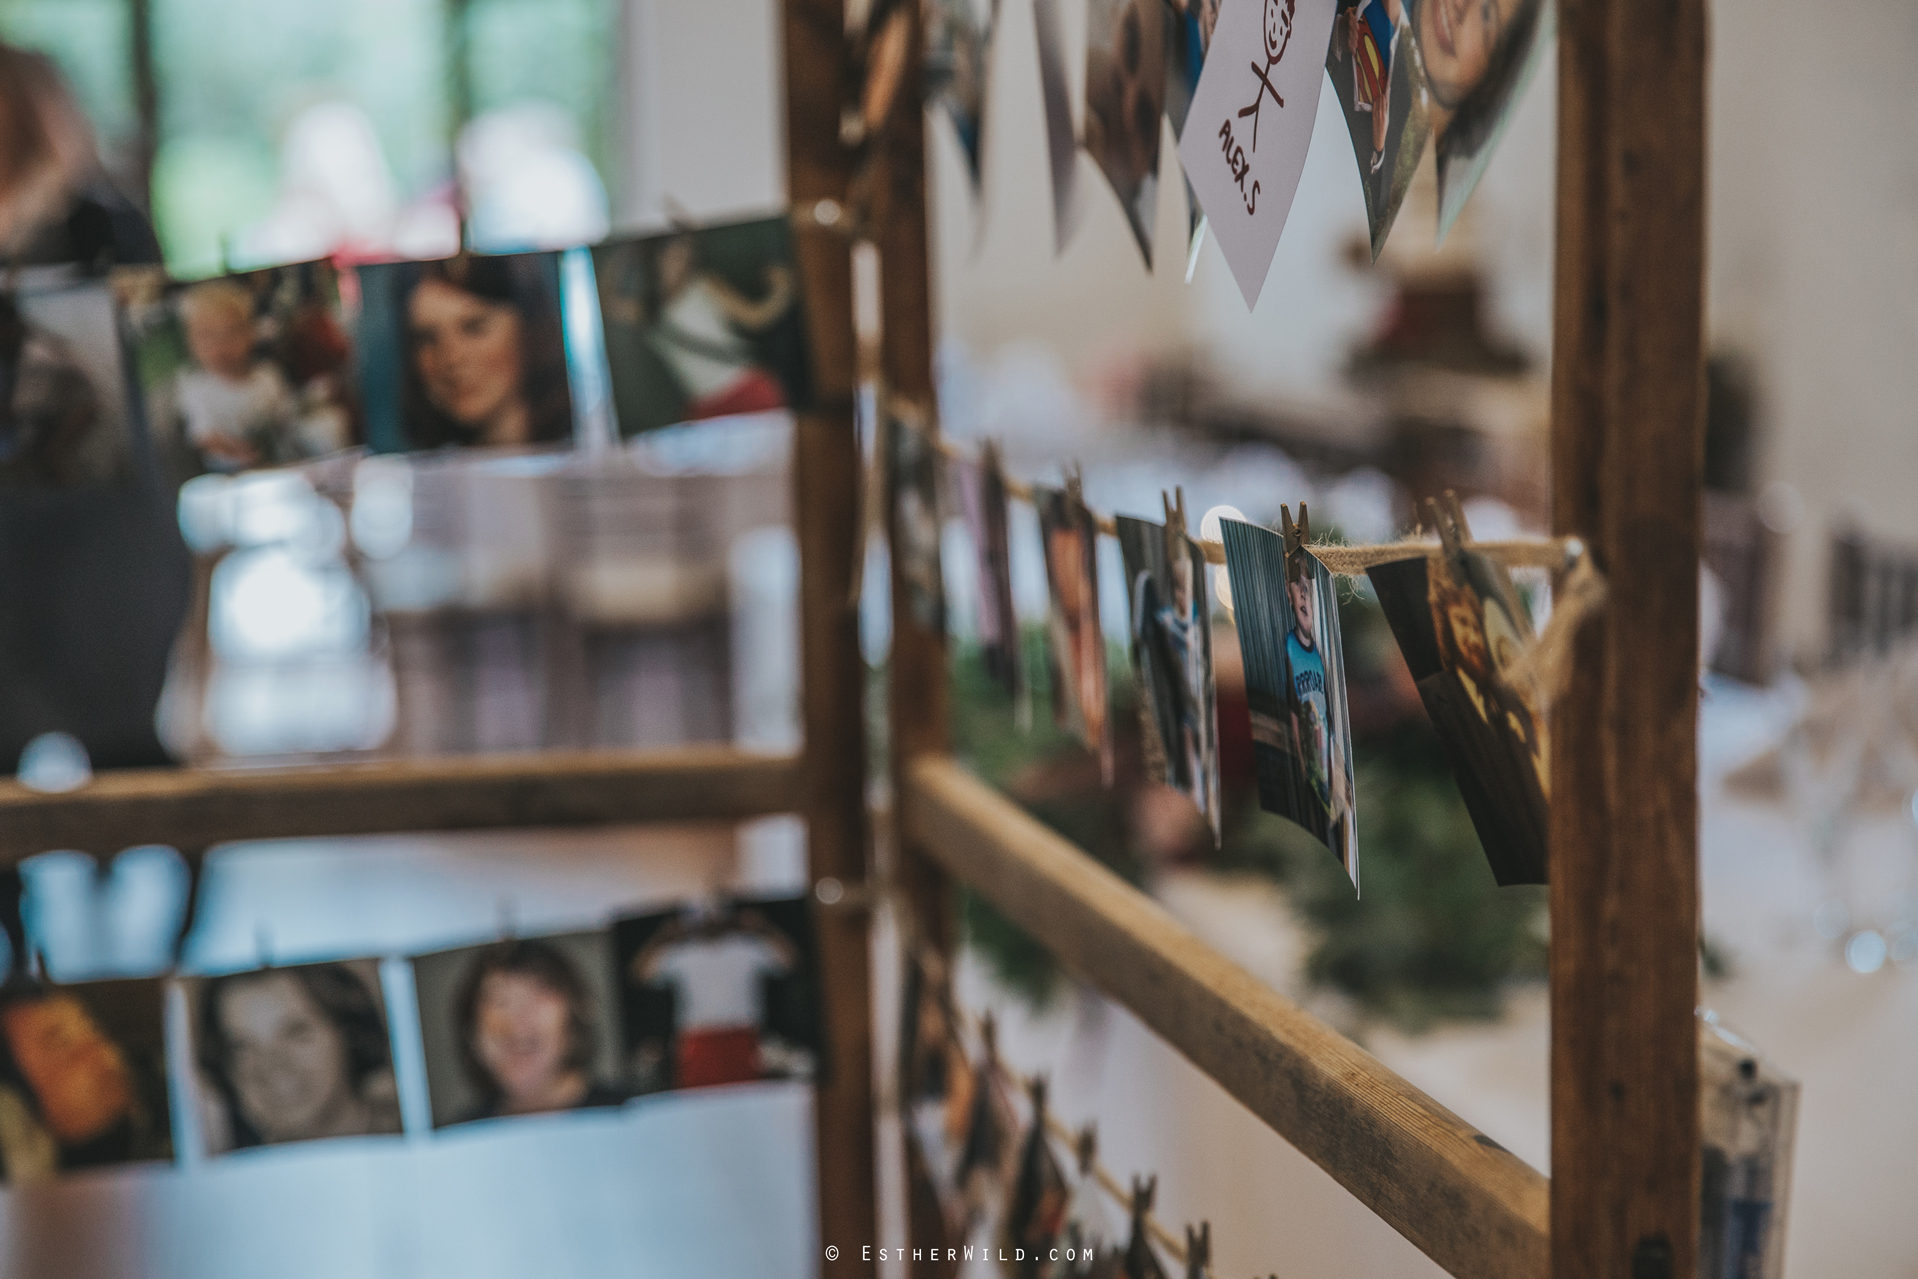 Reading_Room_Weddings_Alby_Norwich_Photographer_Esther_Wild_IMG_1687.jpg